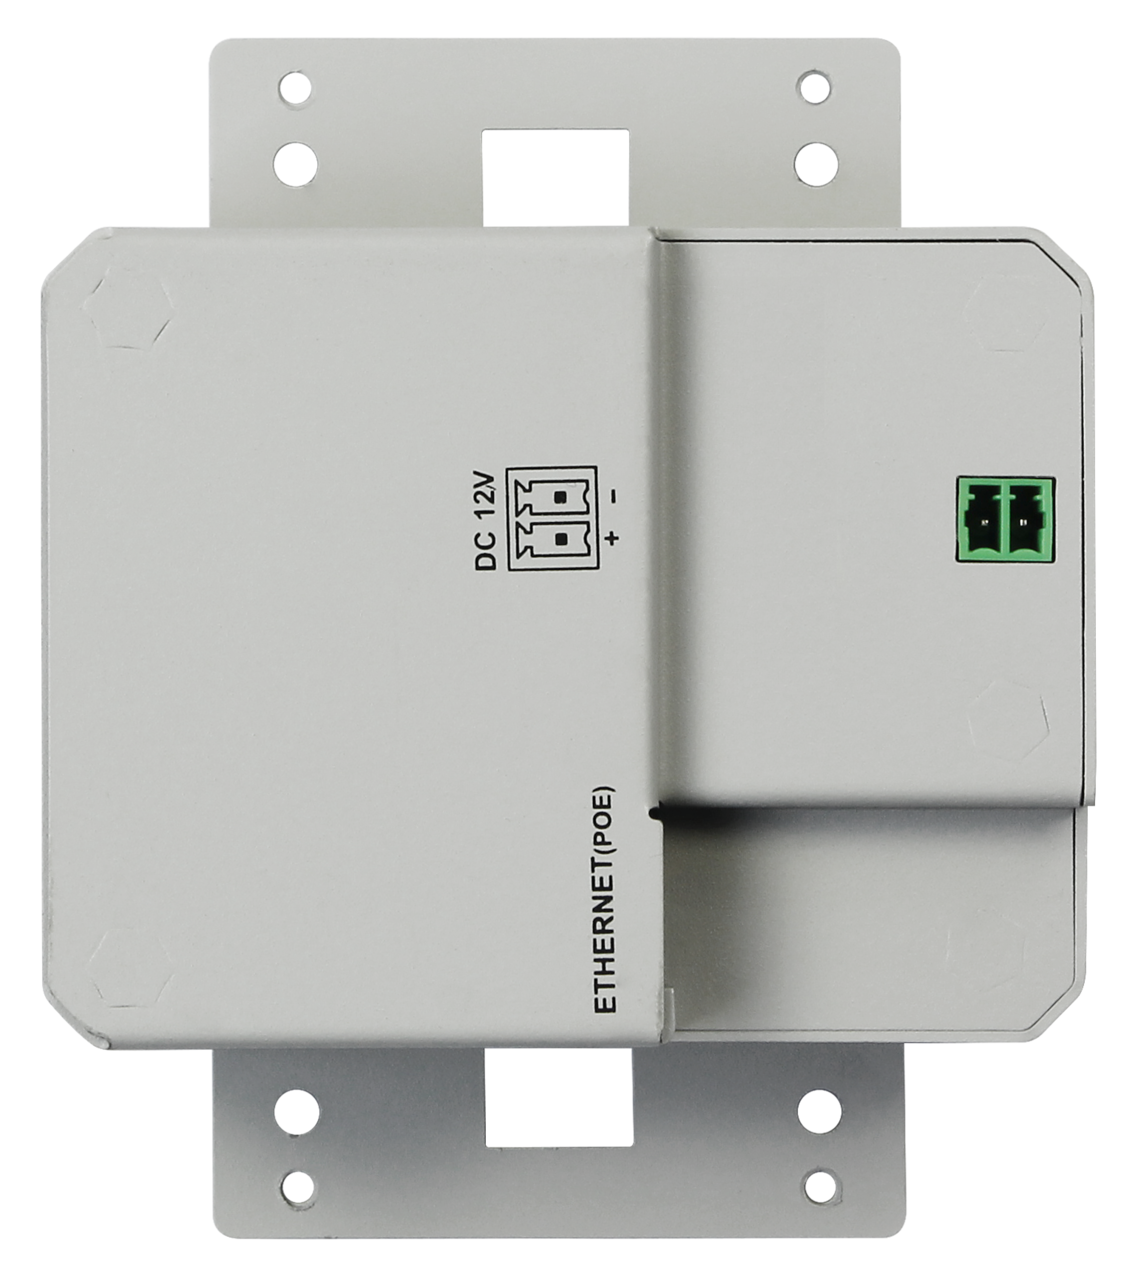 IPEX5001-WP-W - DigitalinxIP 5000 Series AV Over IP HDMI